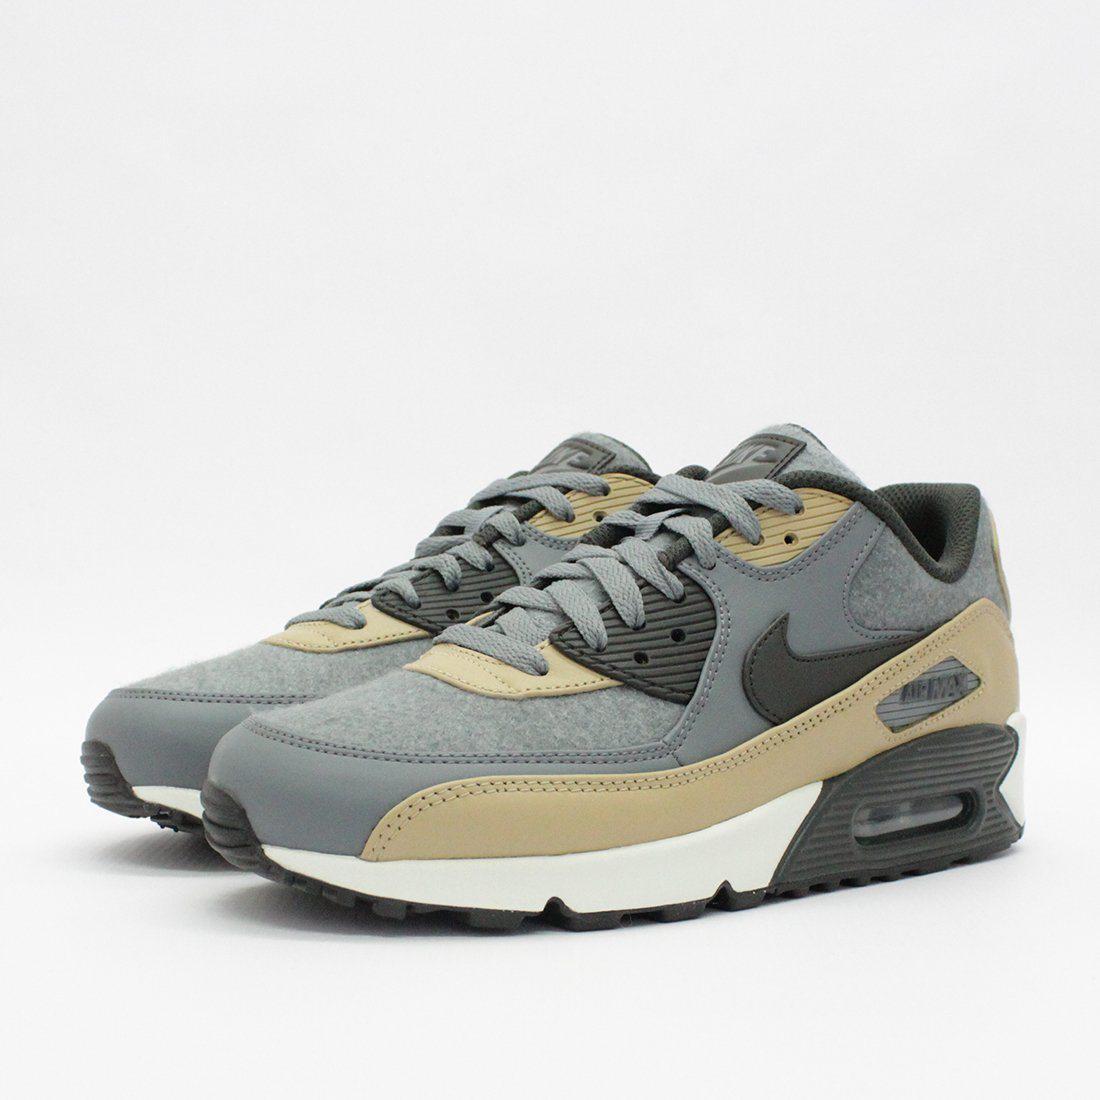 732272e0a97c0 Nike Trainers - Gray Nike Air Max 90 Premium Cool Grey 700155 010 for Men  -. View fullscreen